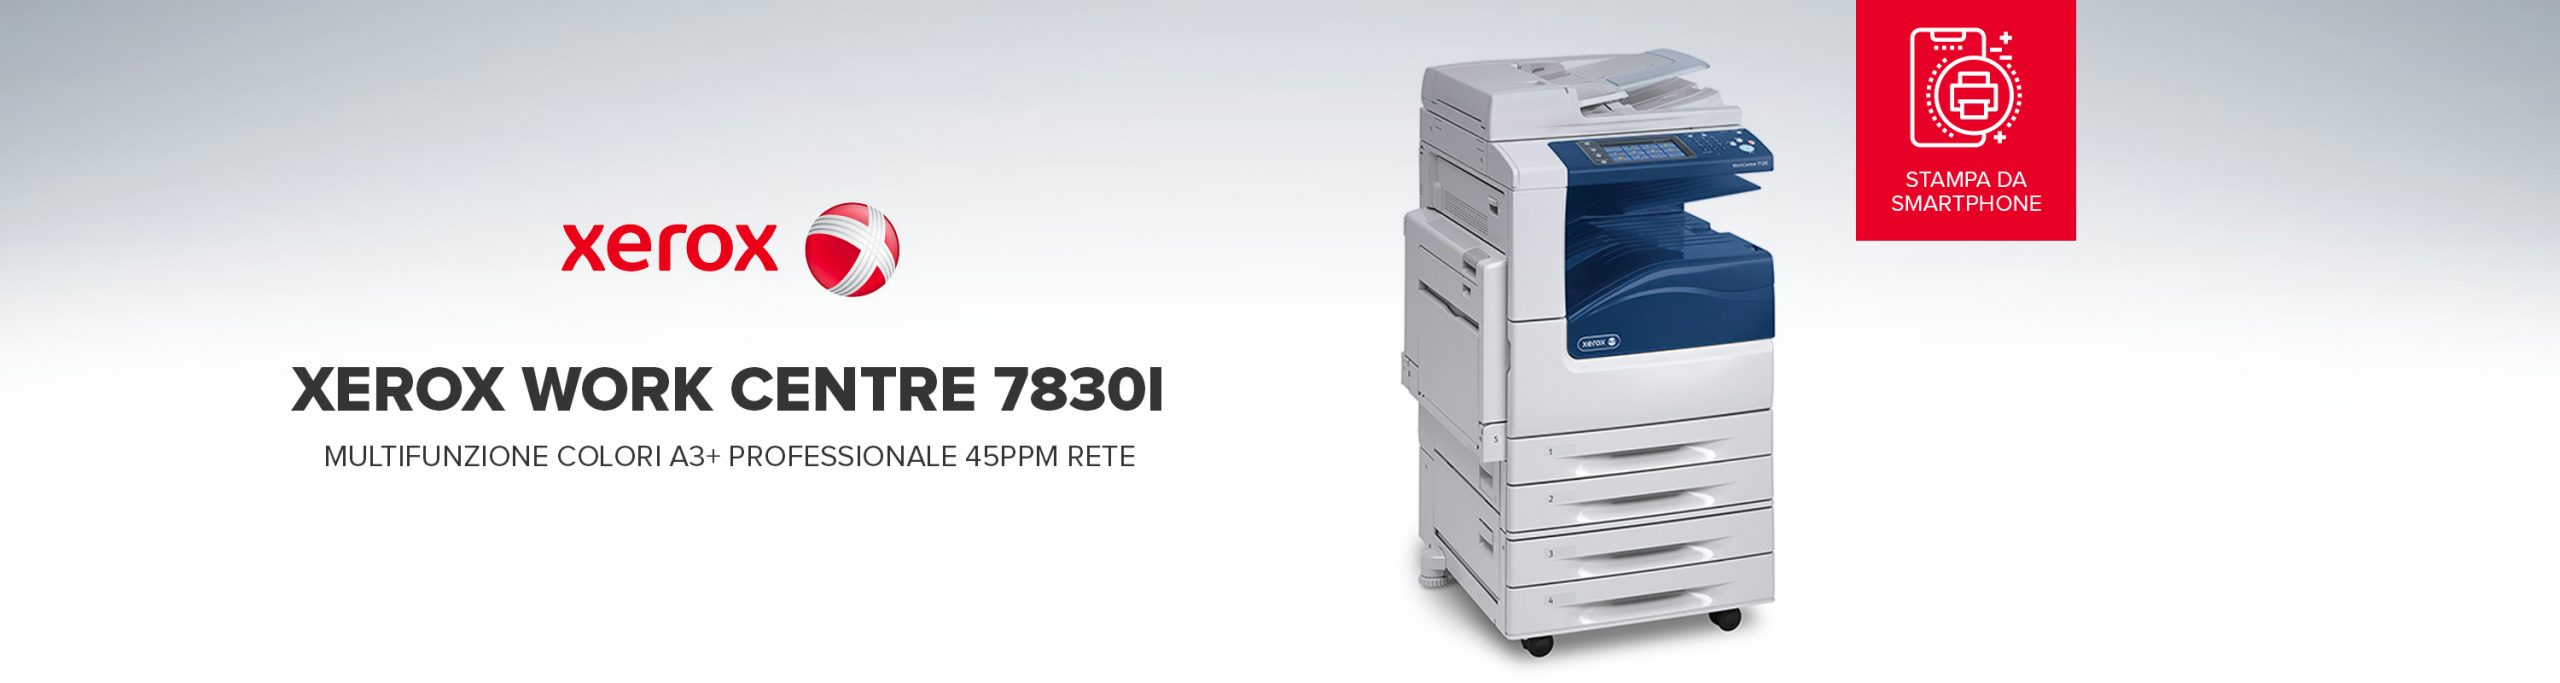 Xerox 7830i